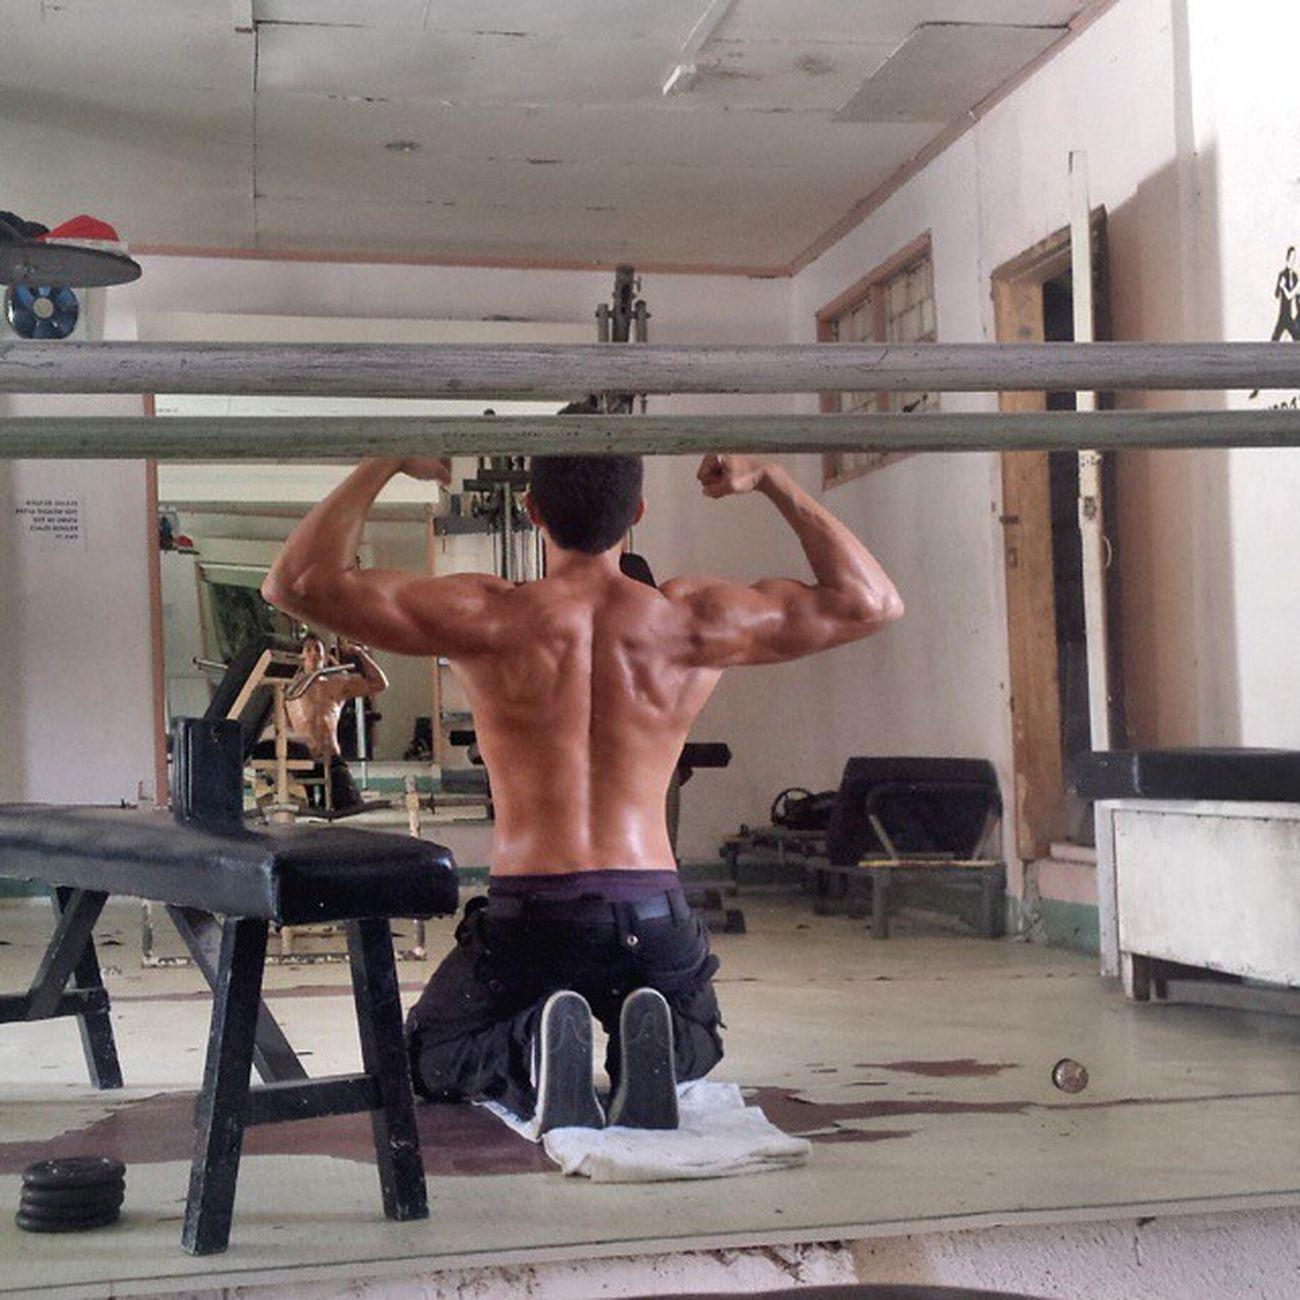 Gains Back Gym Bakithegrappler Yujiro Pinoy German Philippines Keto Shred Macros Rows Latpulldown Viccosta Natty Lift Splitsessions Fit Progress